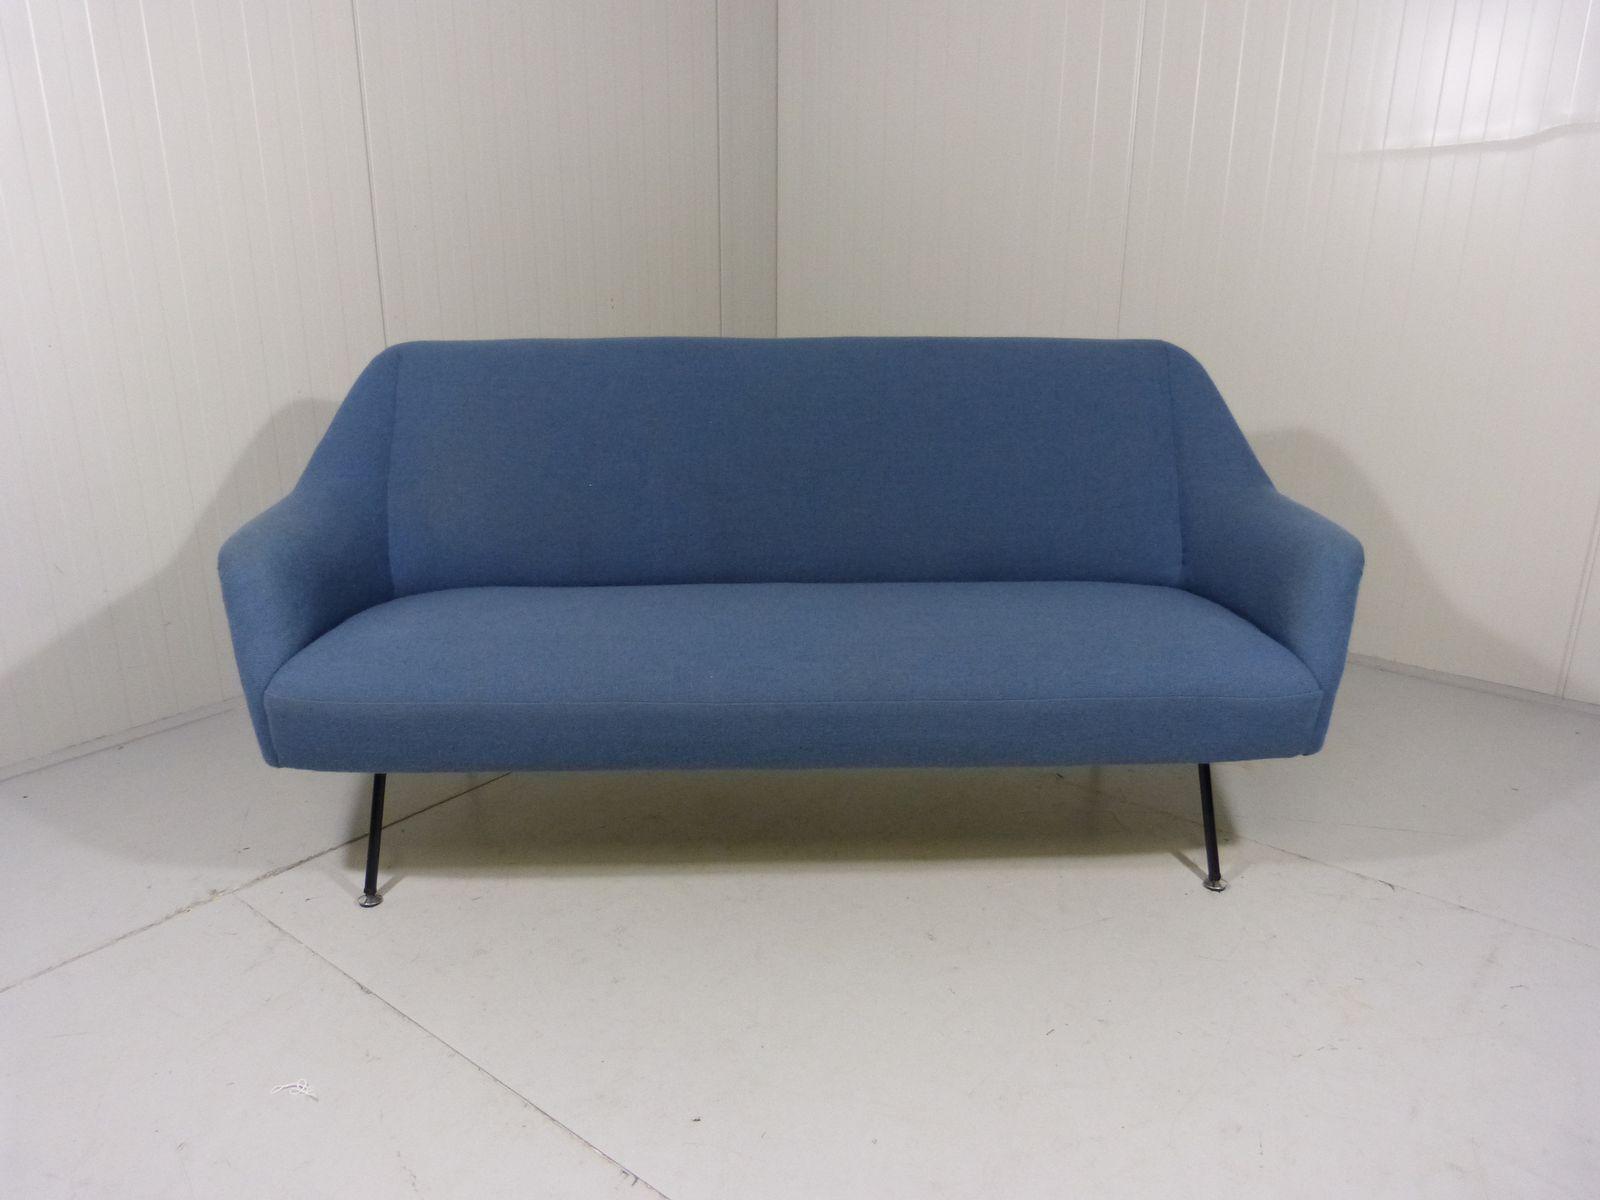 drei sitzer sofa 1950er bei pamono kaufen. Black Bedroom Furniture Sets. Home Design Ideas